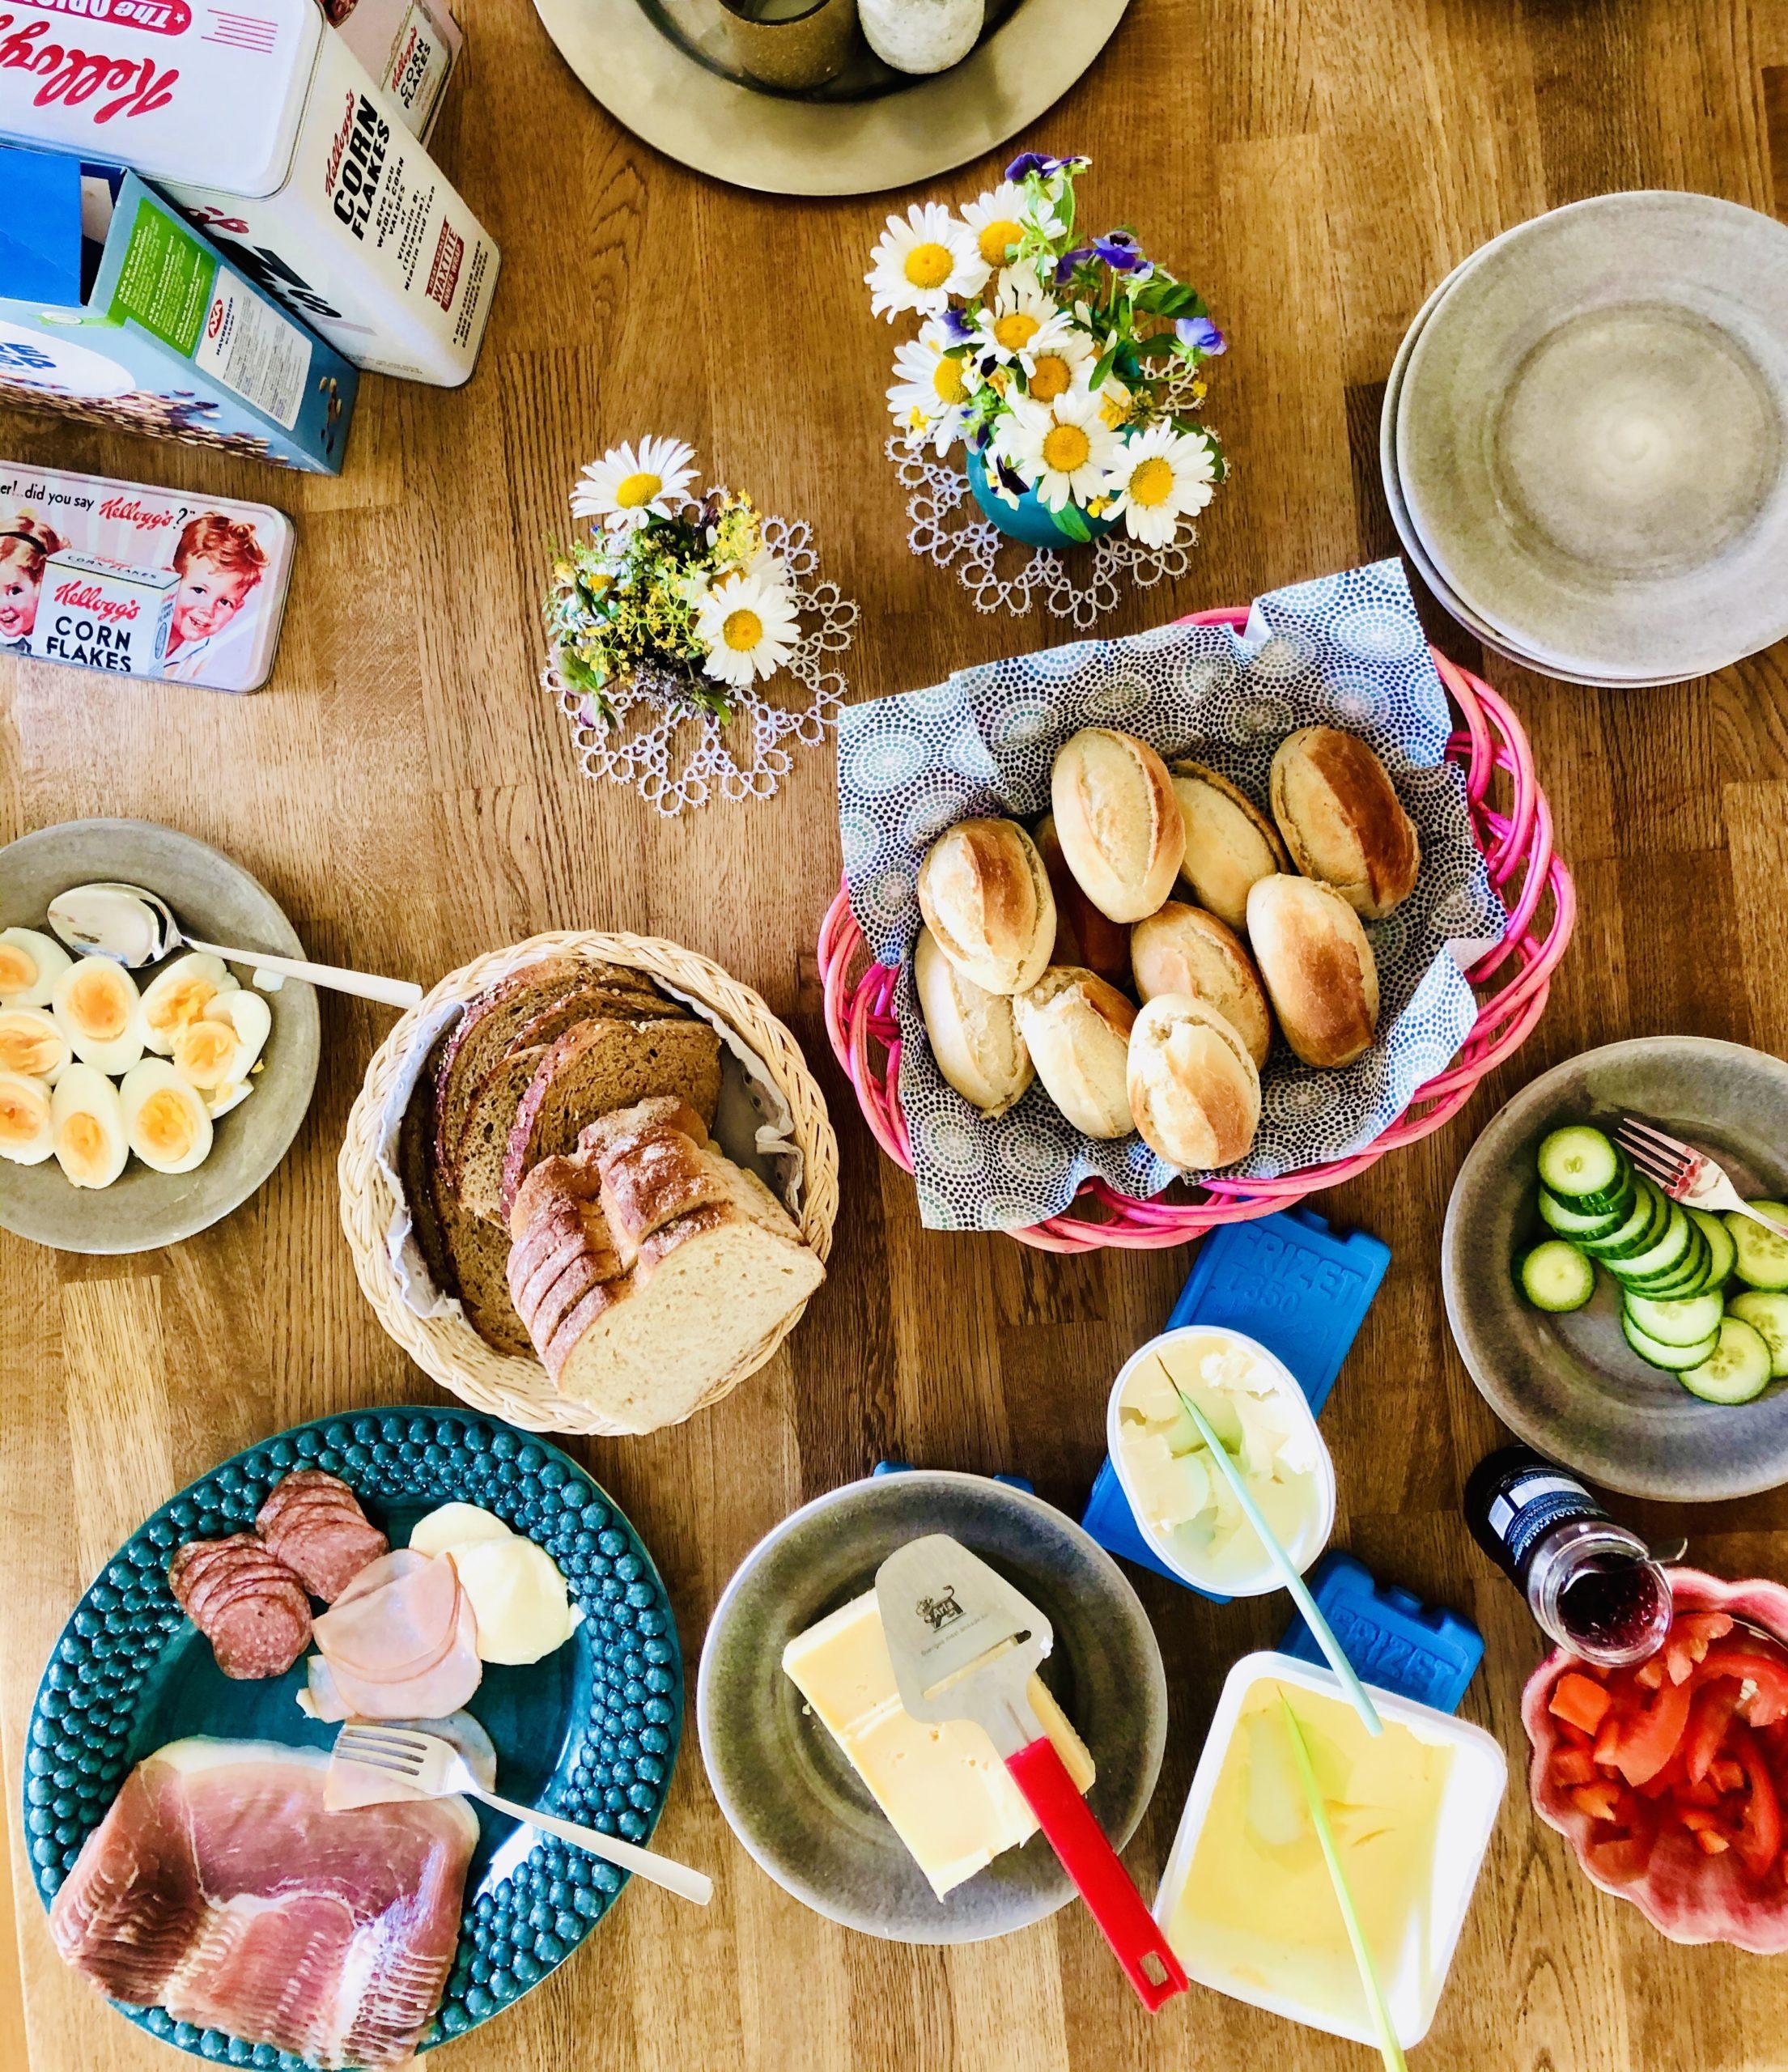 Frukost midsommardagen